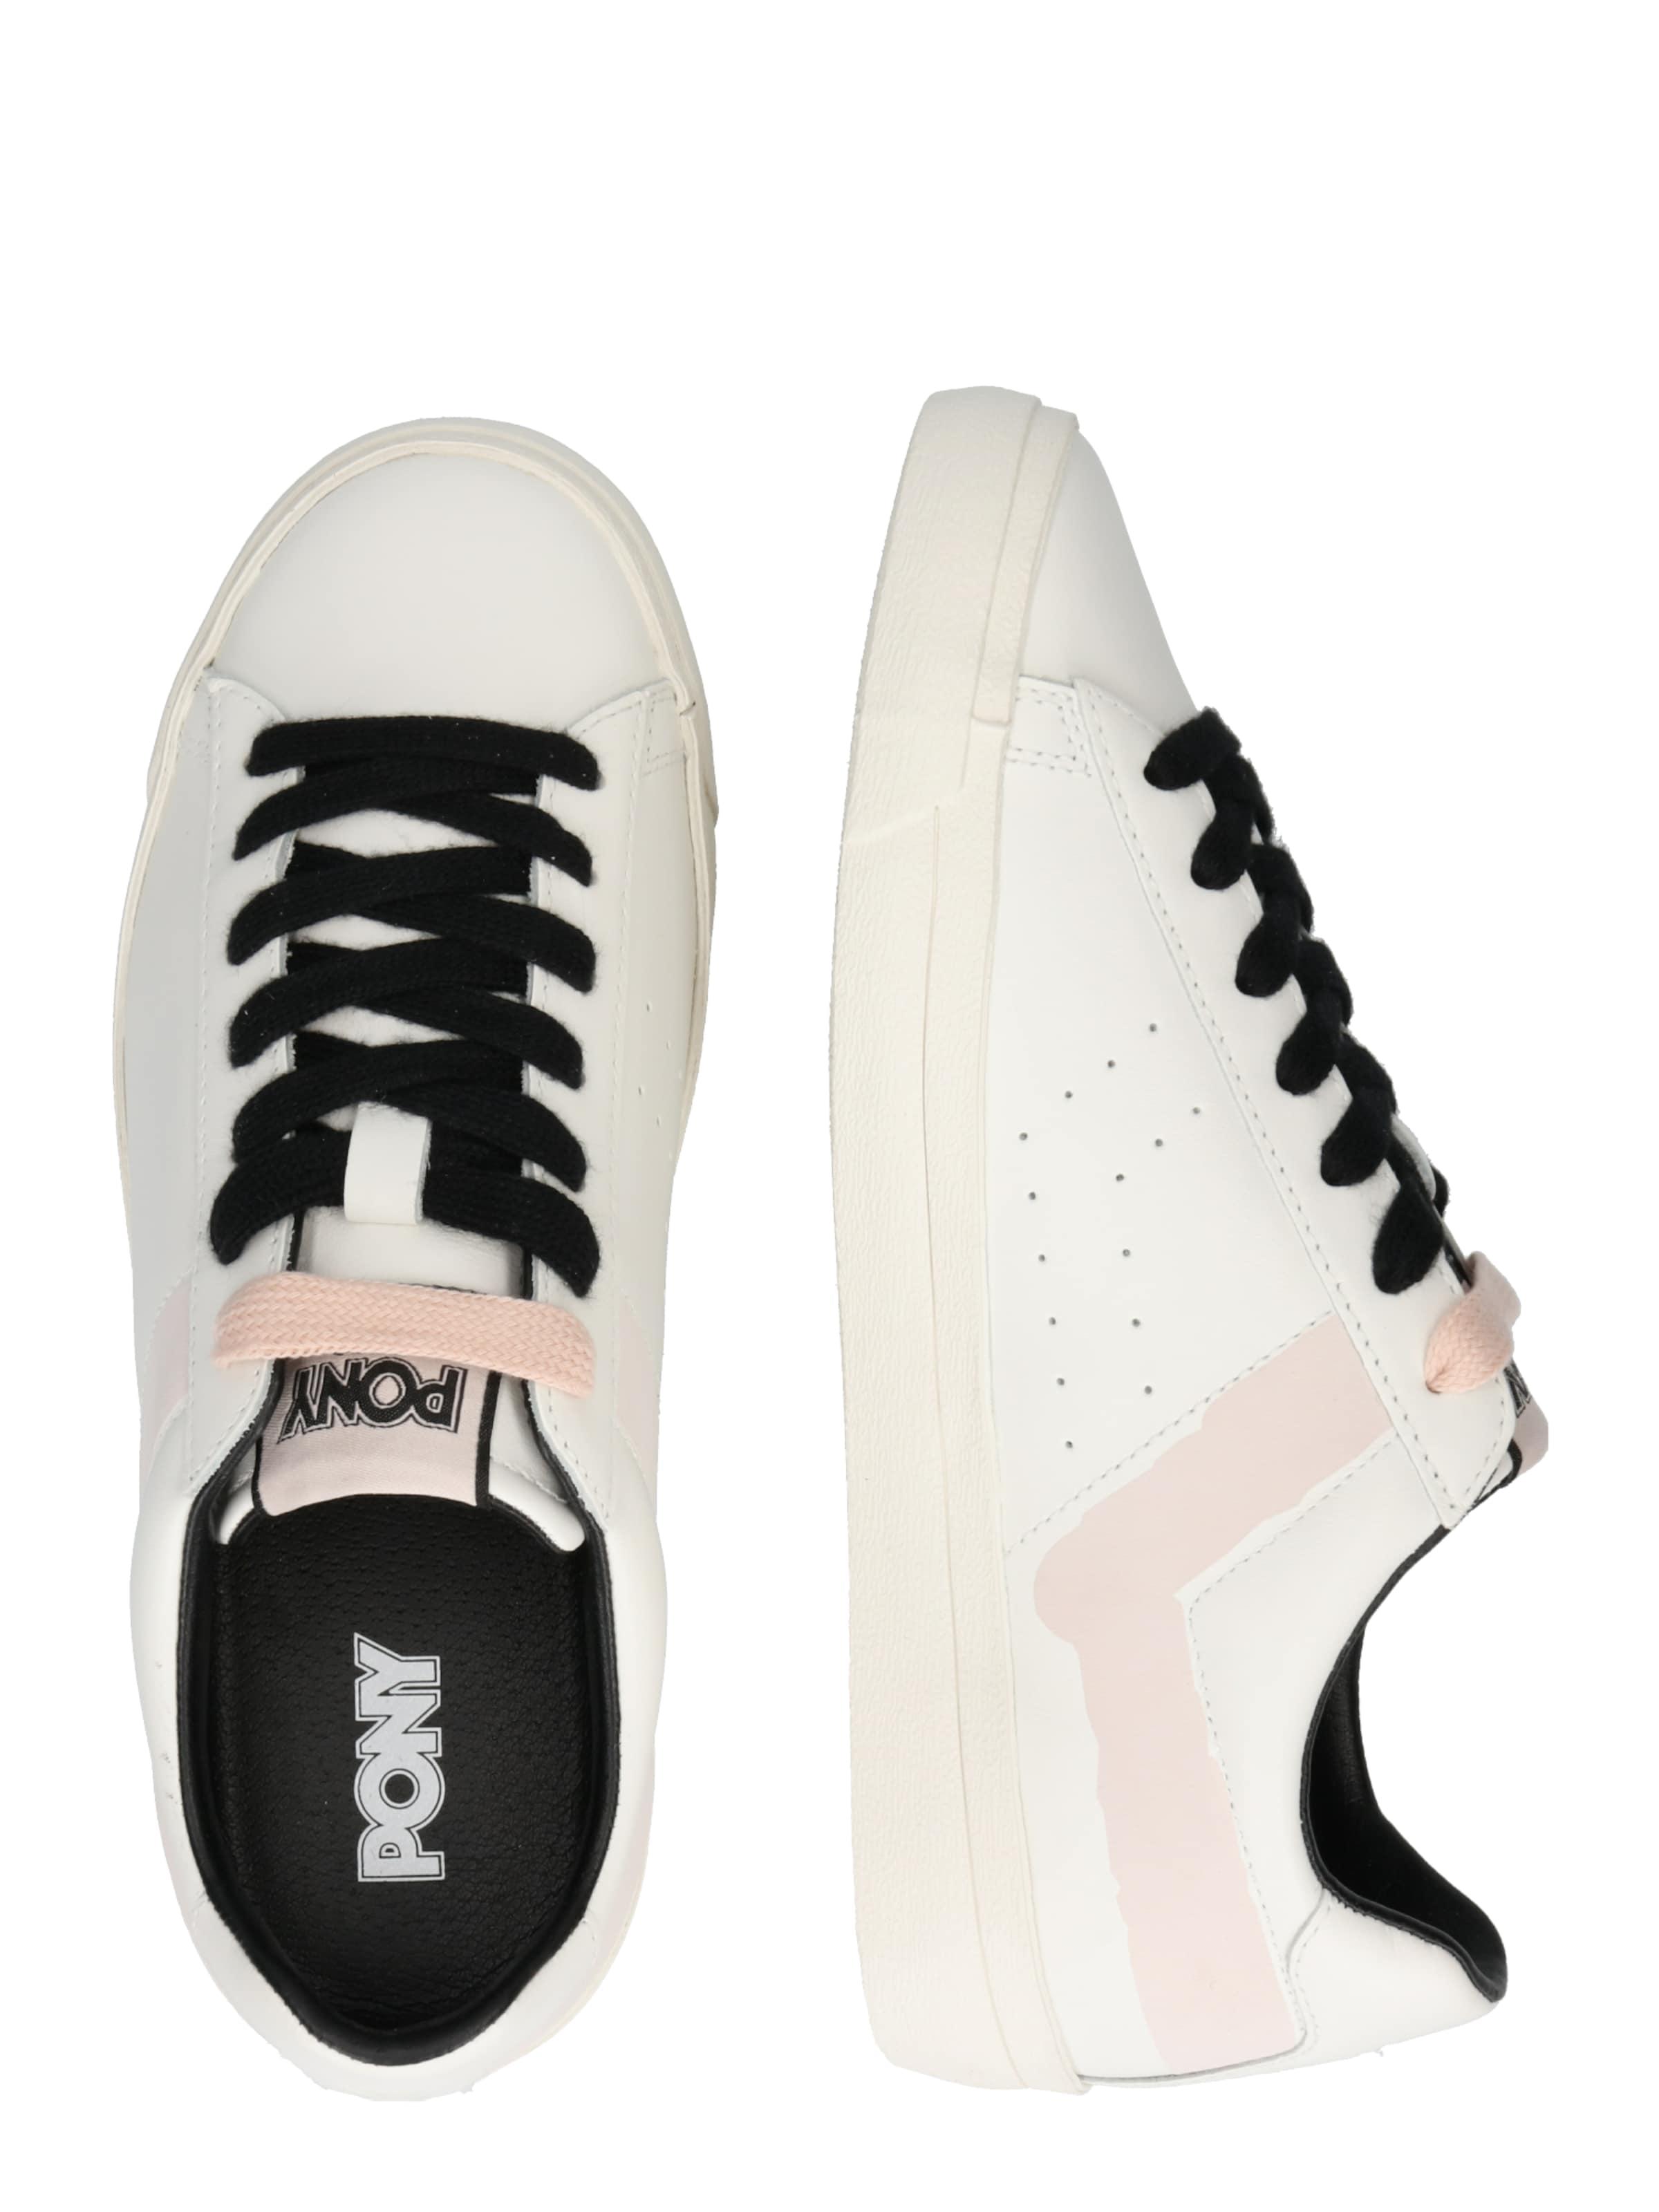 RosaSilber 'topstar' Sneaker Weiß Pony In mNnv80wO